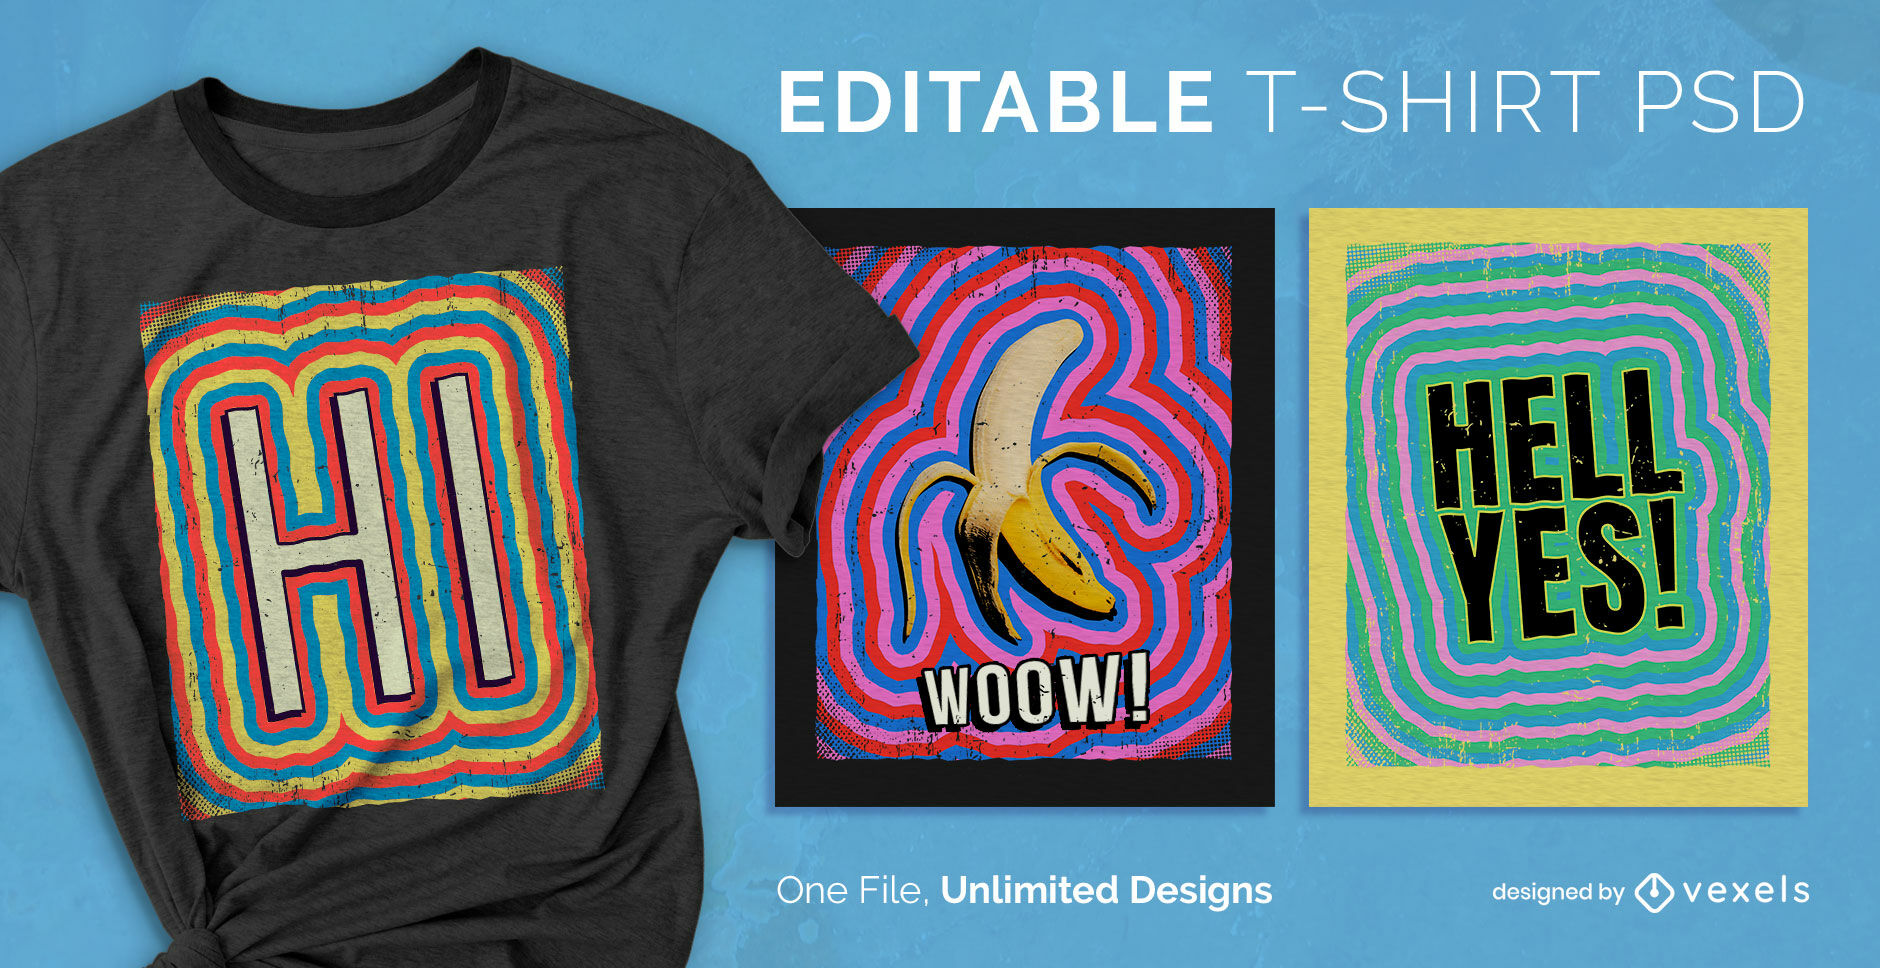 Camiseta psd editable con trazo de color psicod?lico